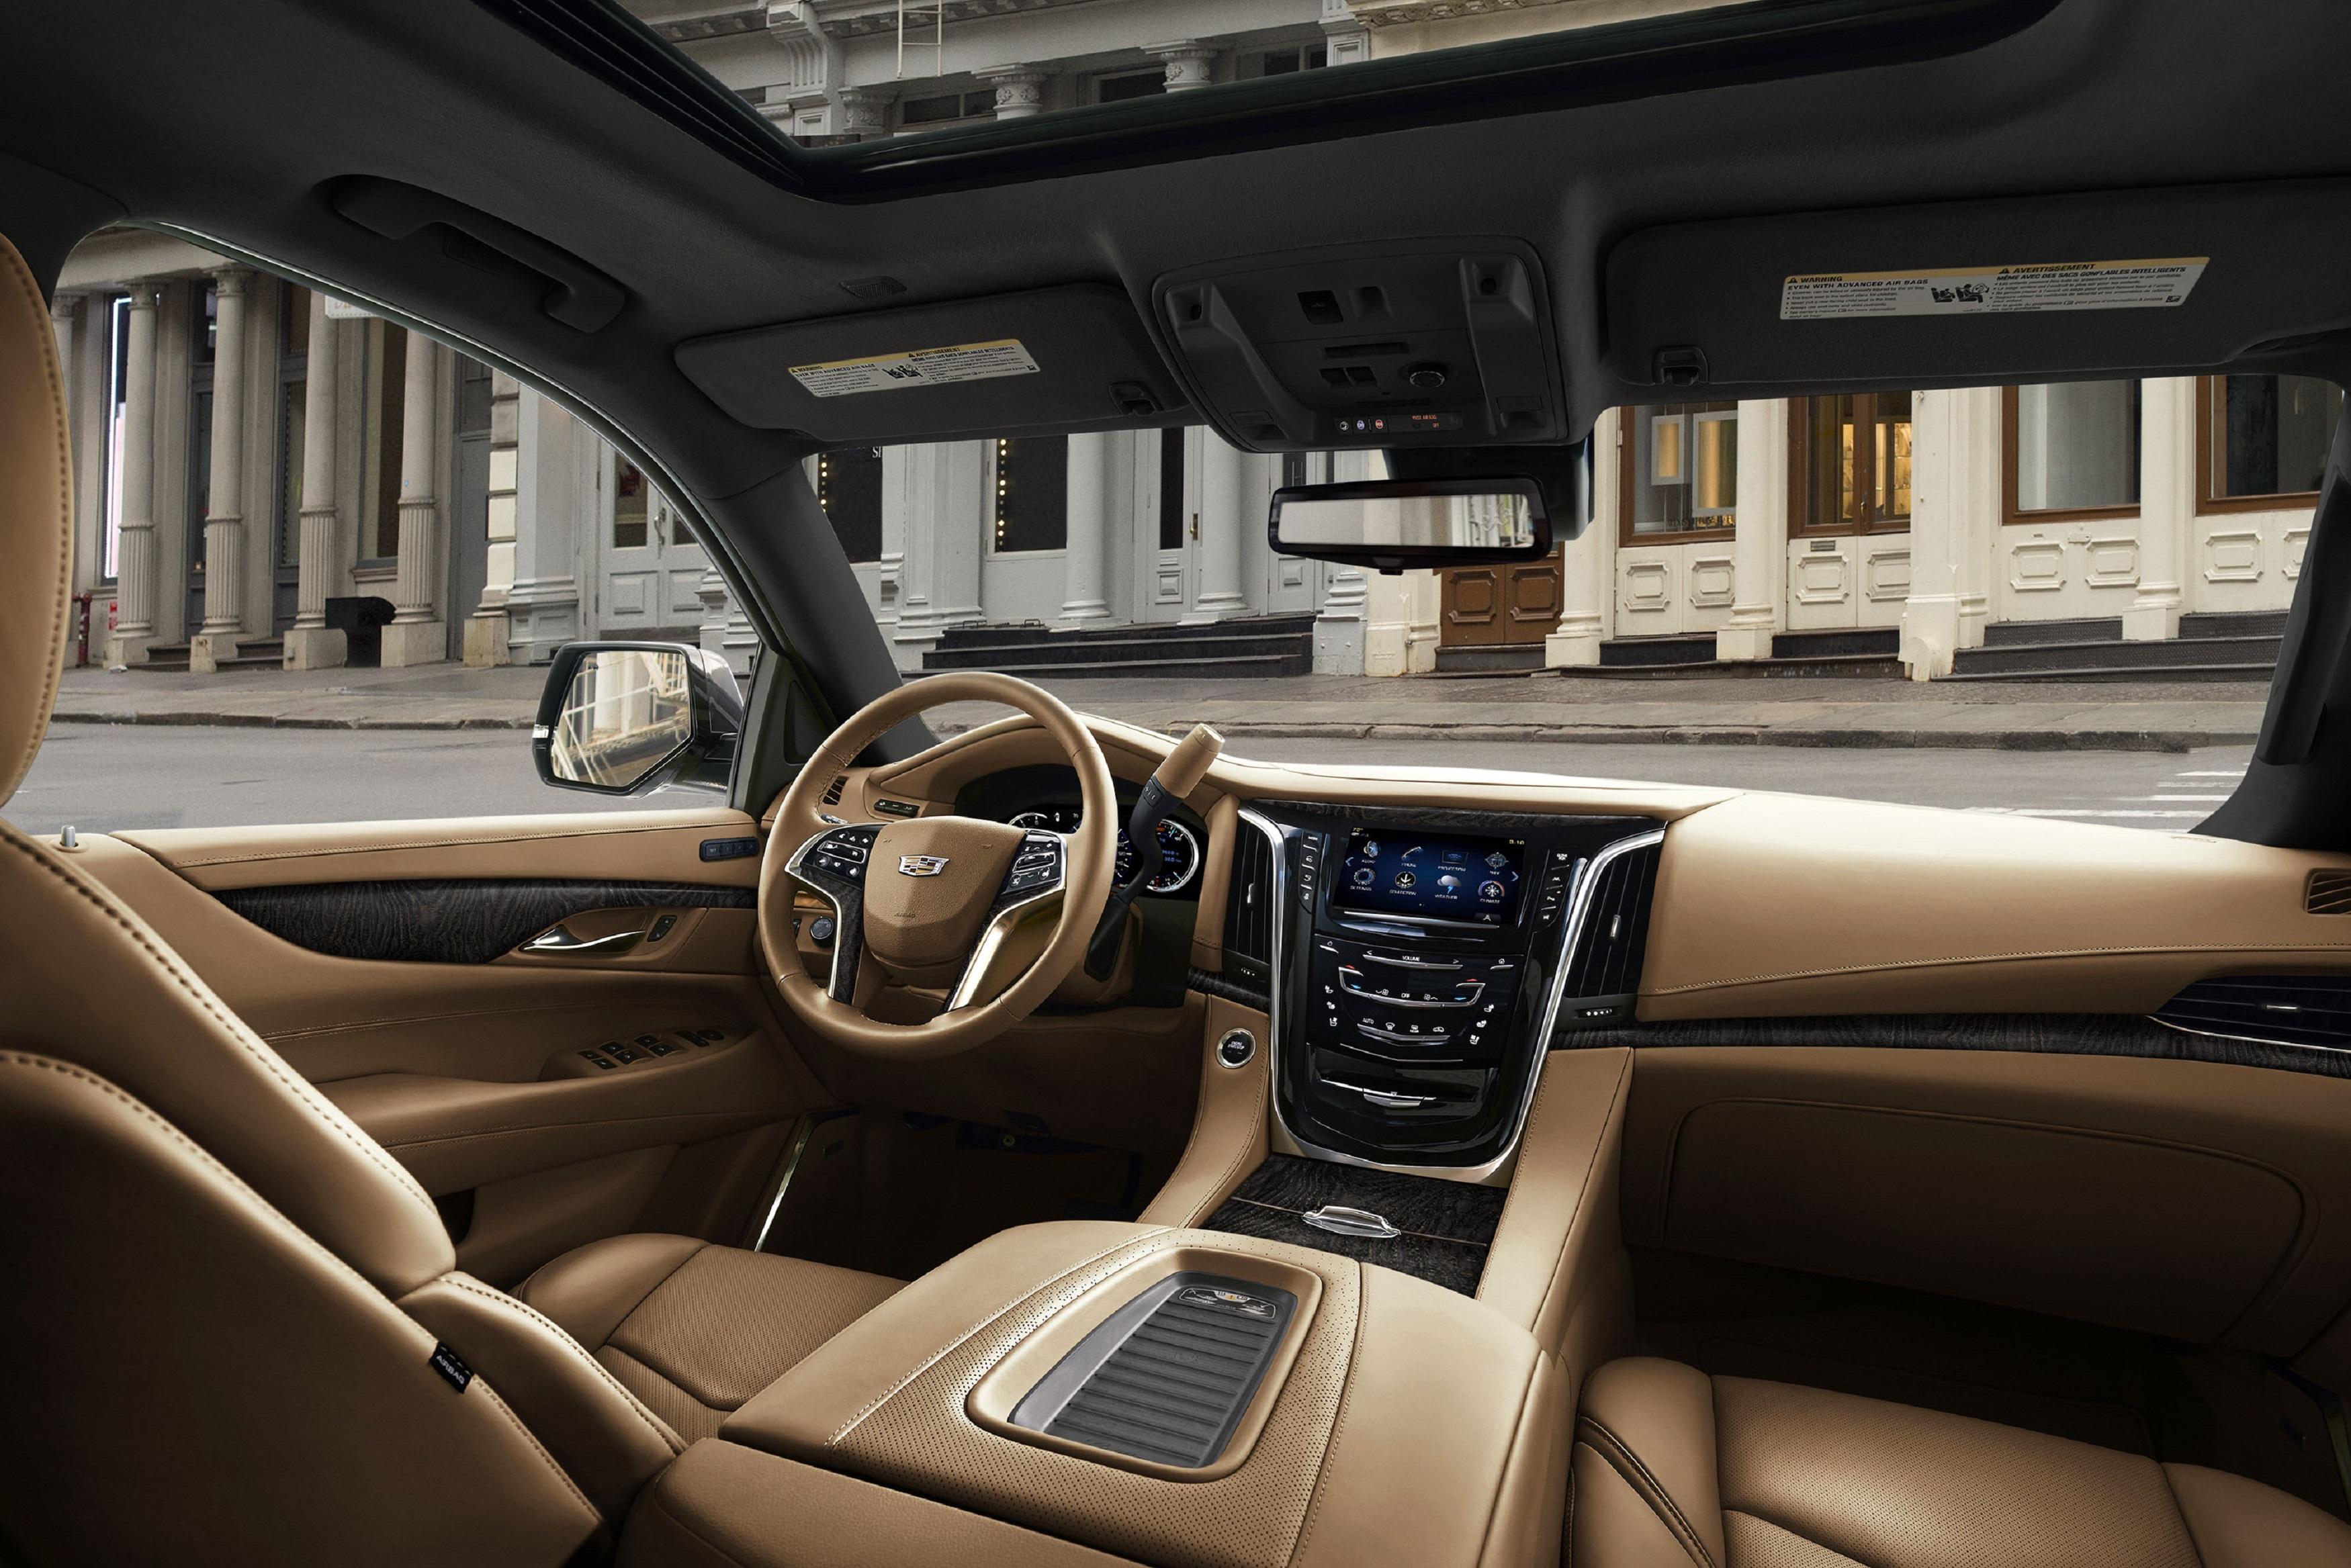 2018 Cadillac Escalade New 10 Automatic Big On Luxury New On